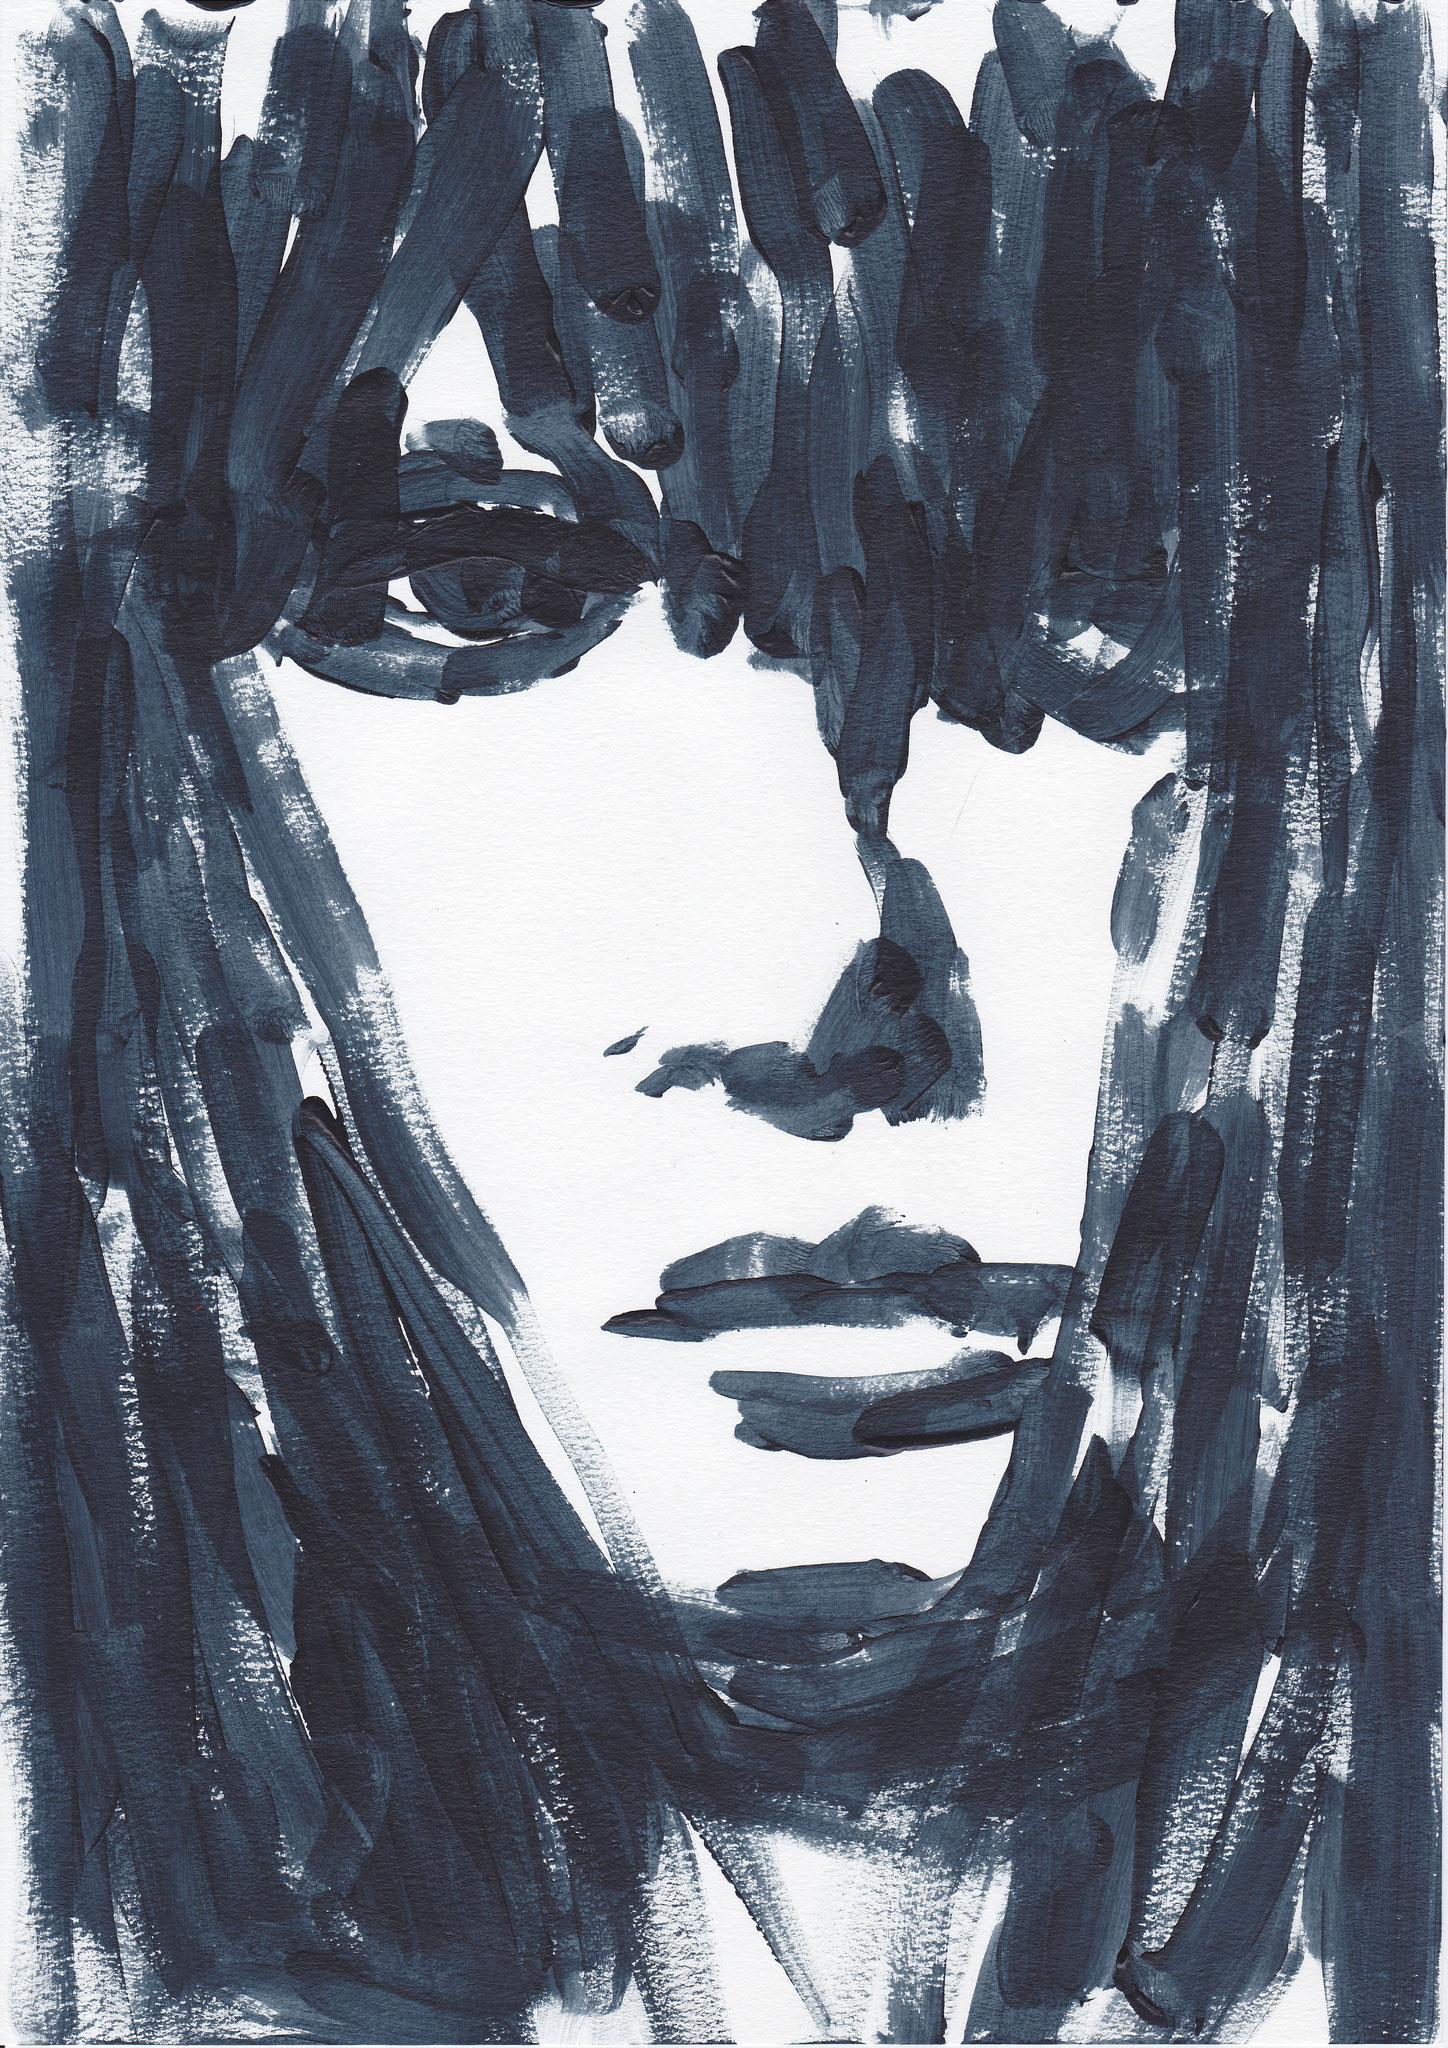 011 , acrylic on paper , 29.7 x 21cm , Selina Saranova